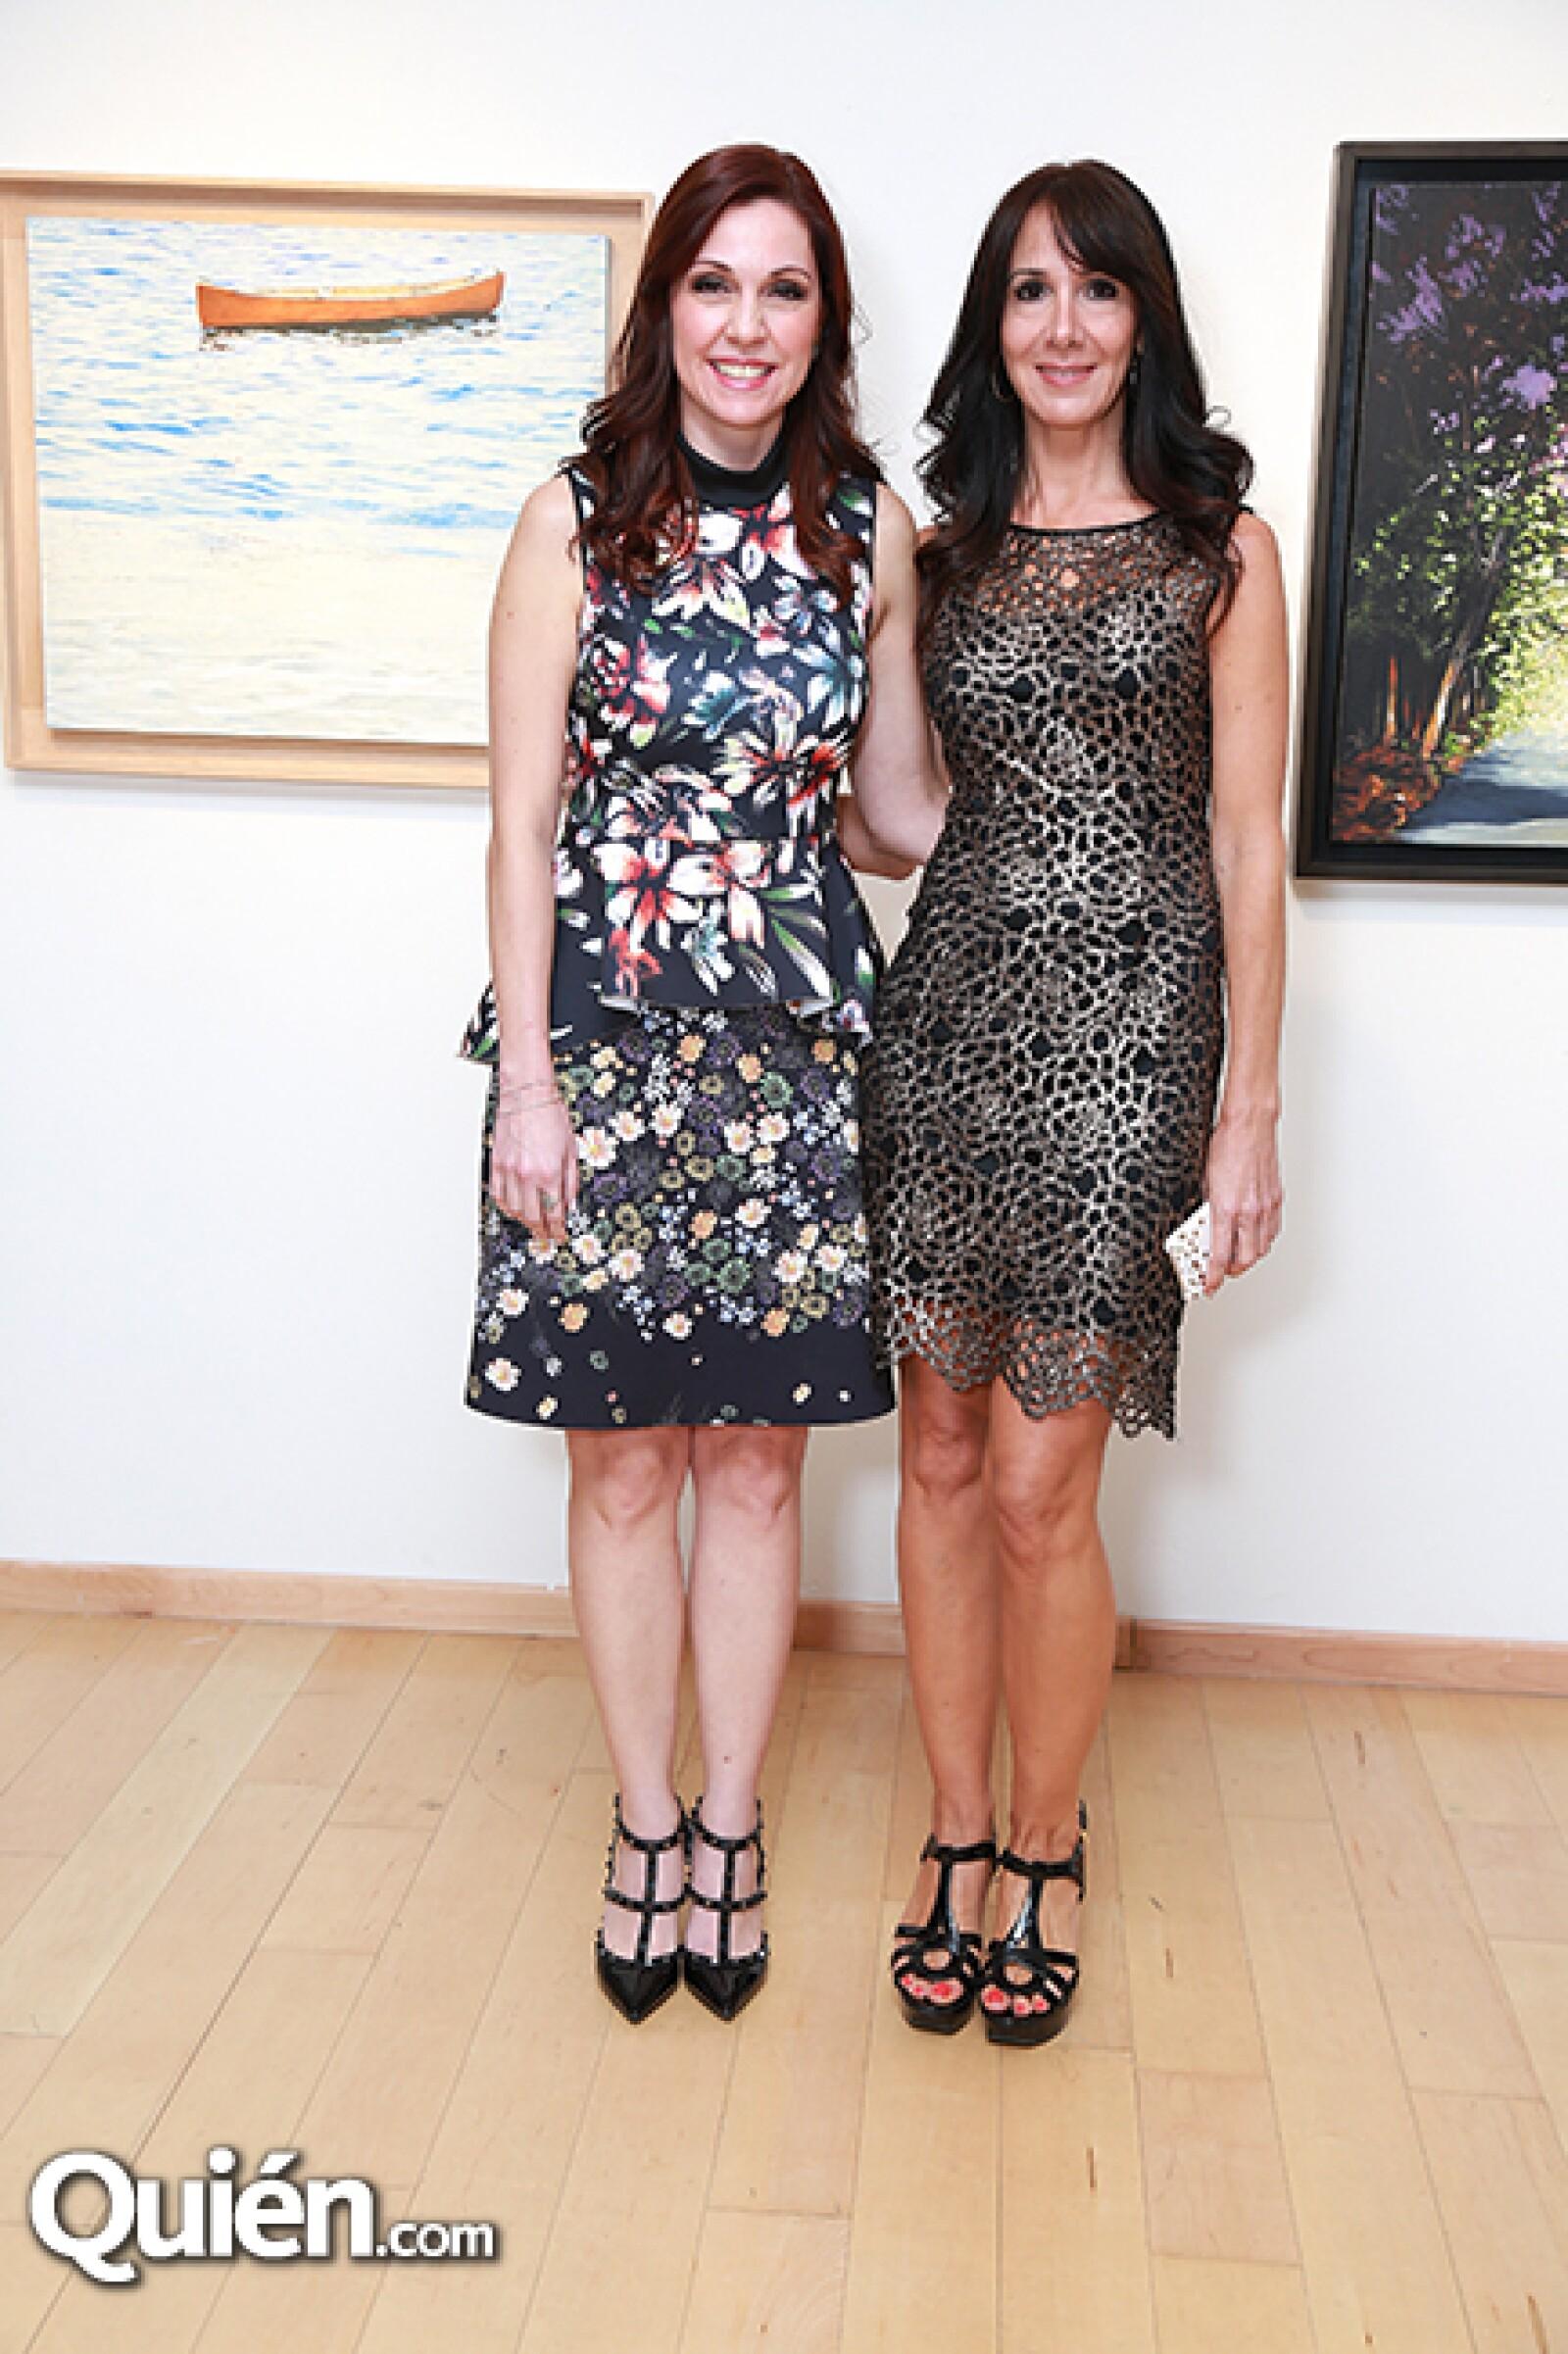 Laura Garza de Garza e Isabel Roesch de Rubies